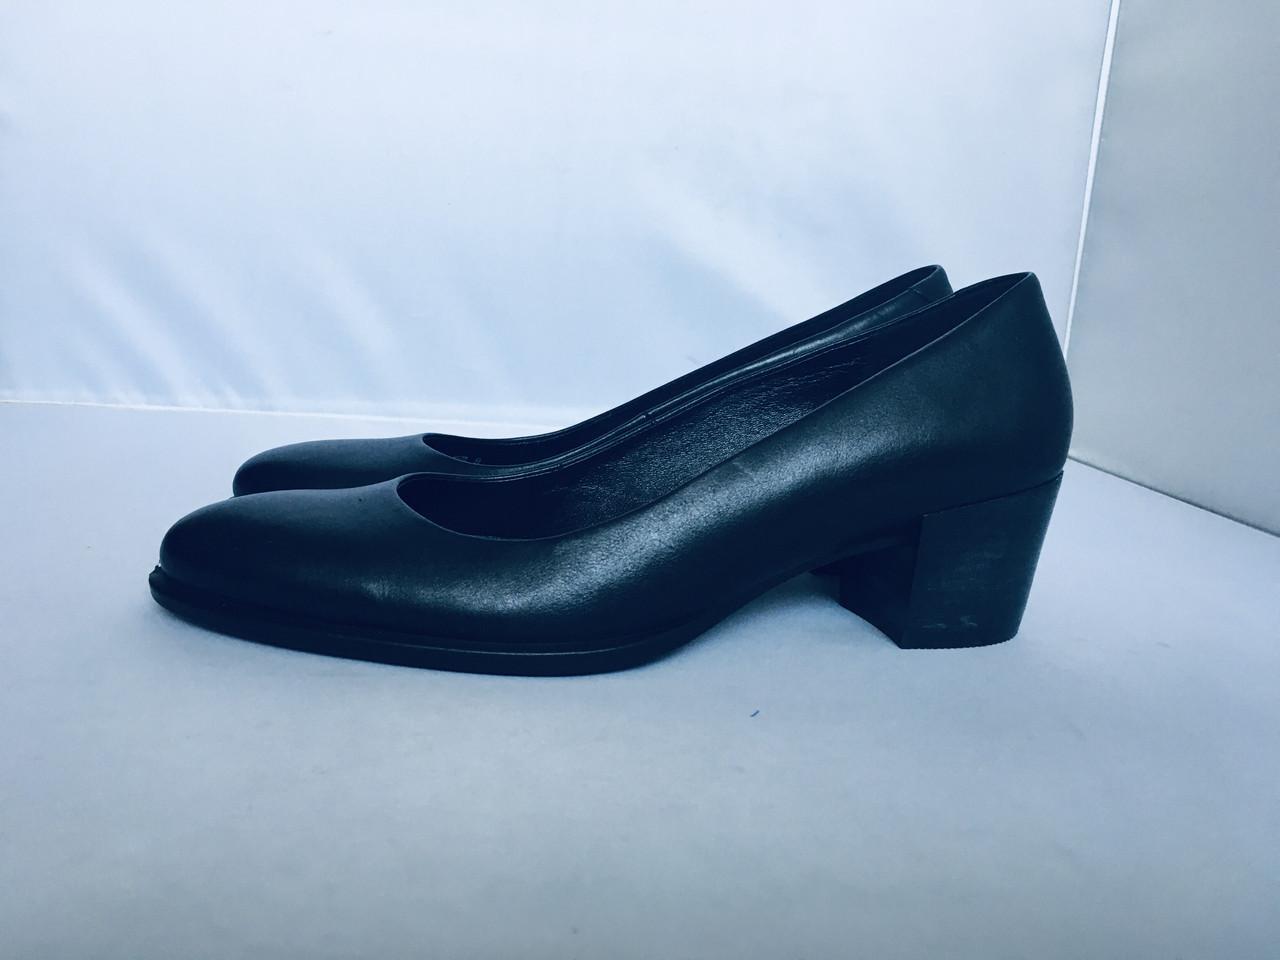 Женские туфли Ecco, 38 размер